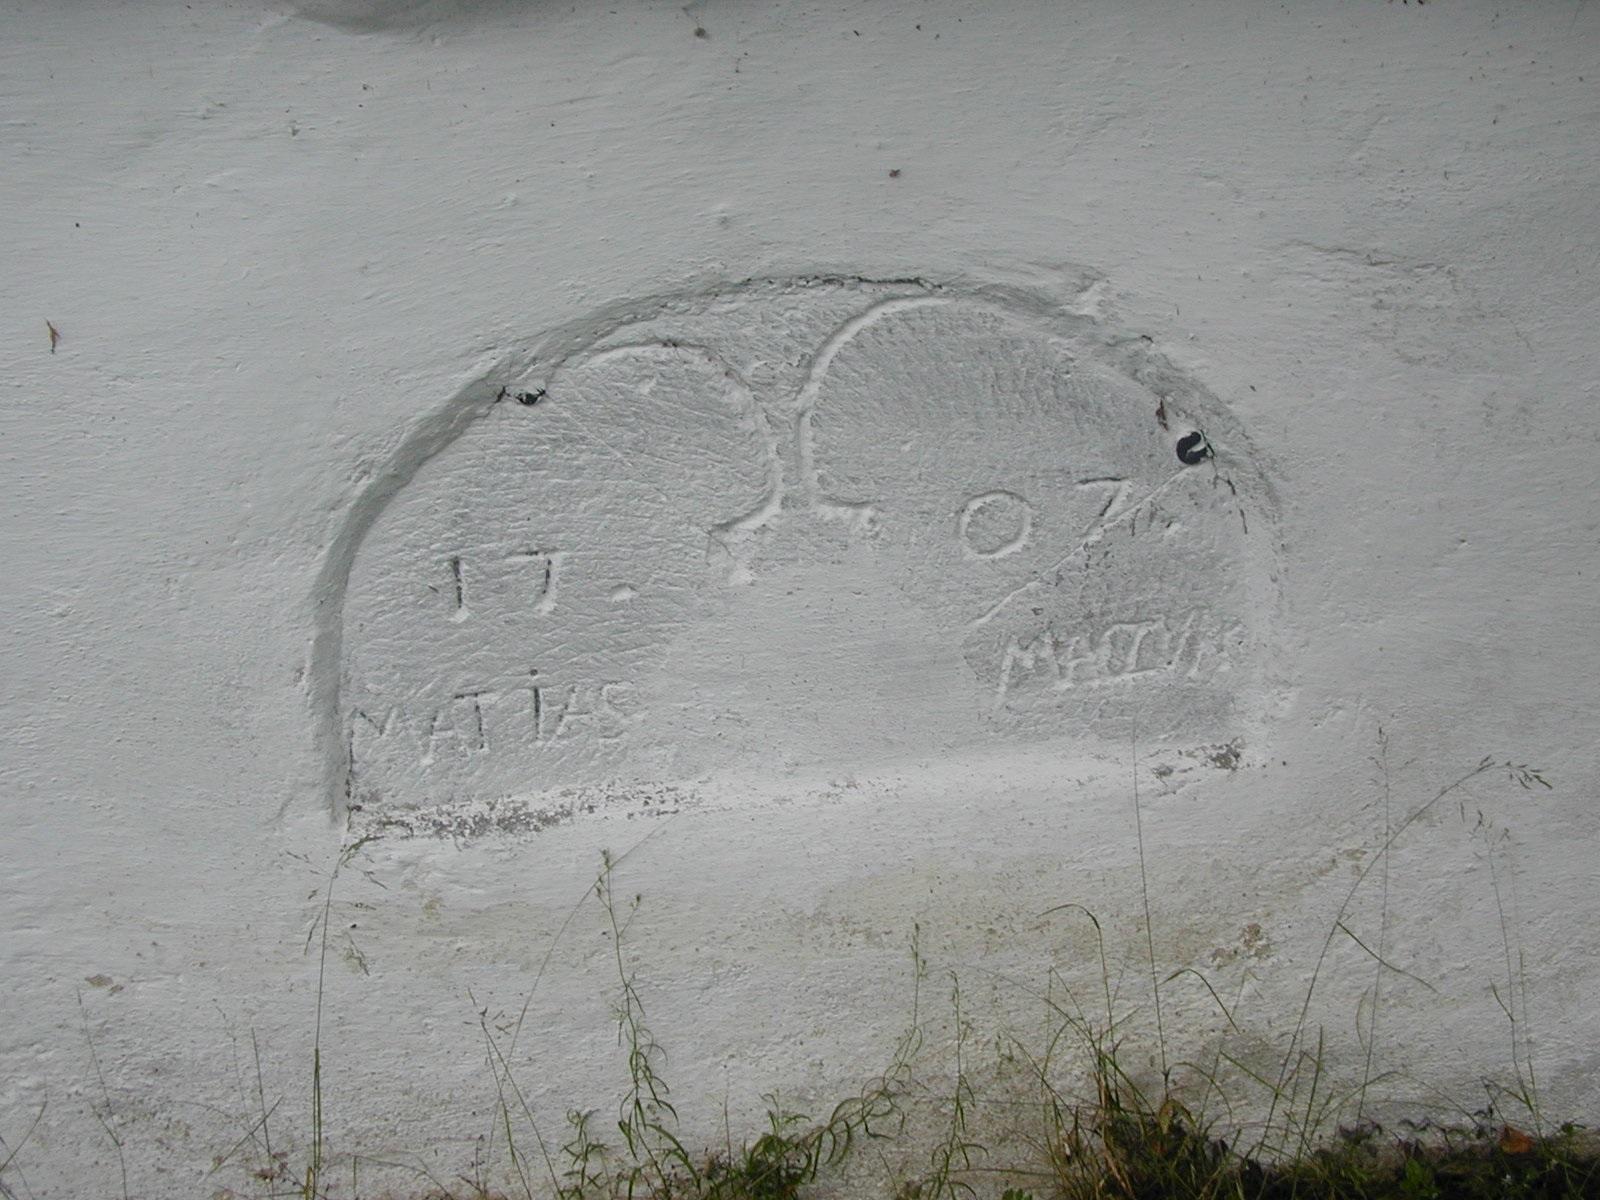 náhrobek Matiase Maczuka, obrázek se otevře v novém okně